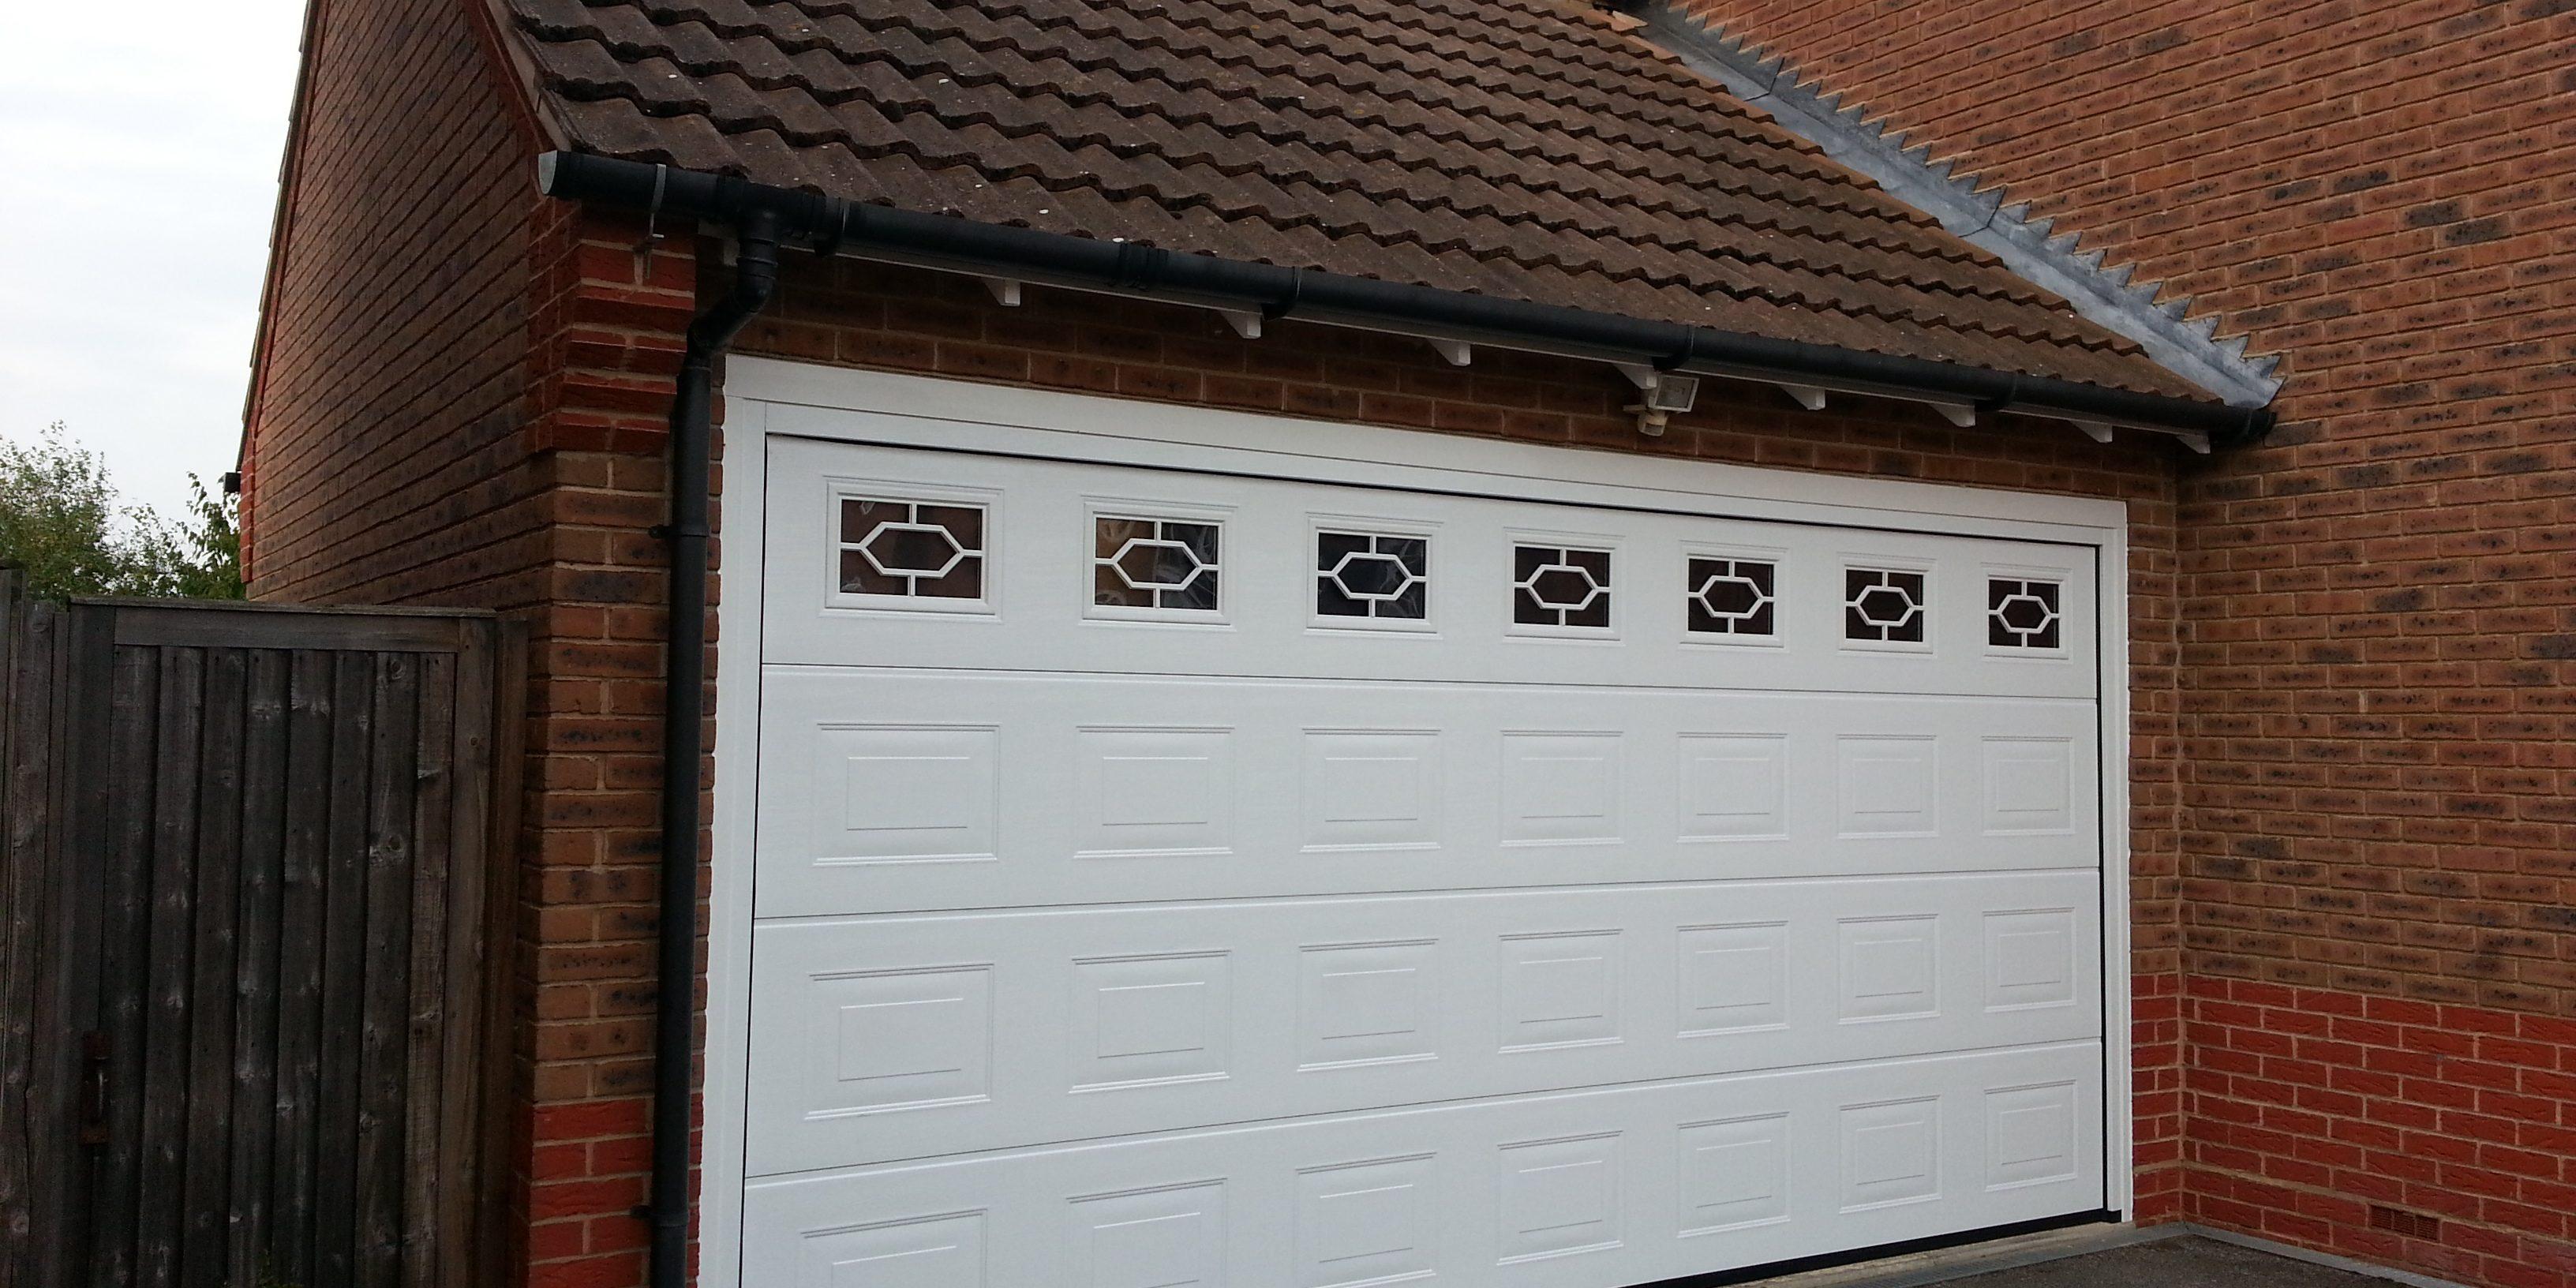 New Garage Door Stamford 1. New Garage Door Stamford   Automatic Sectional Garador   Garage